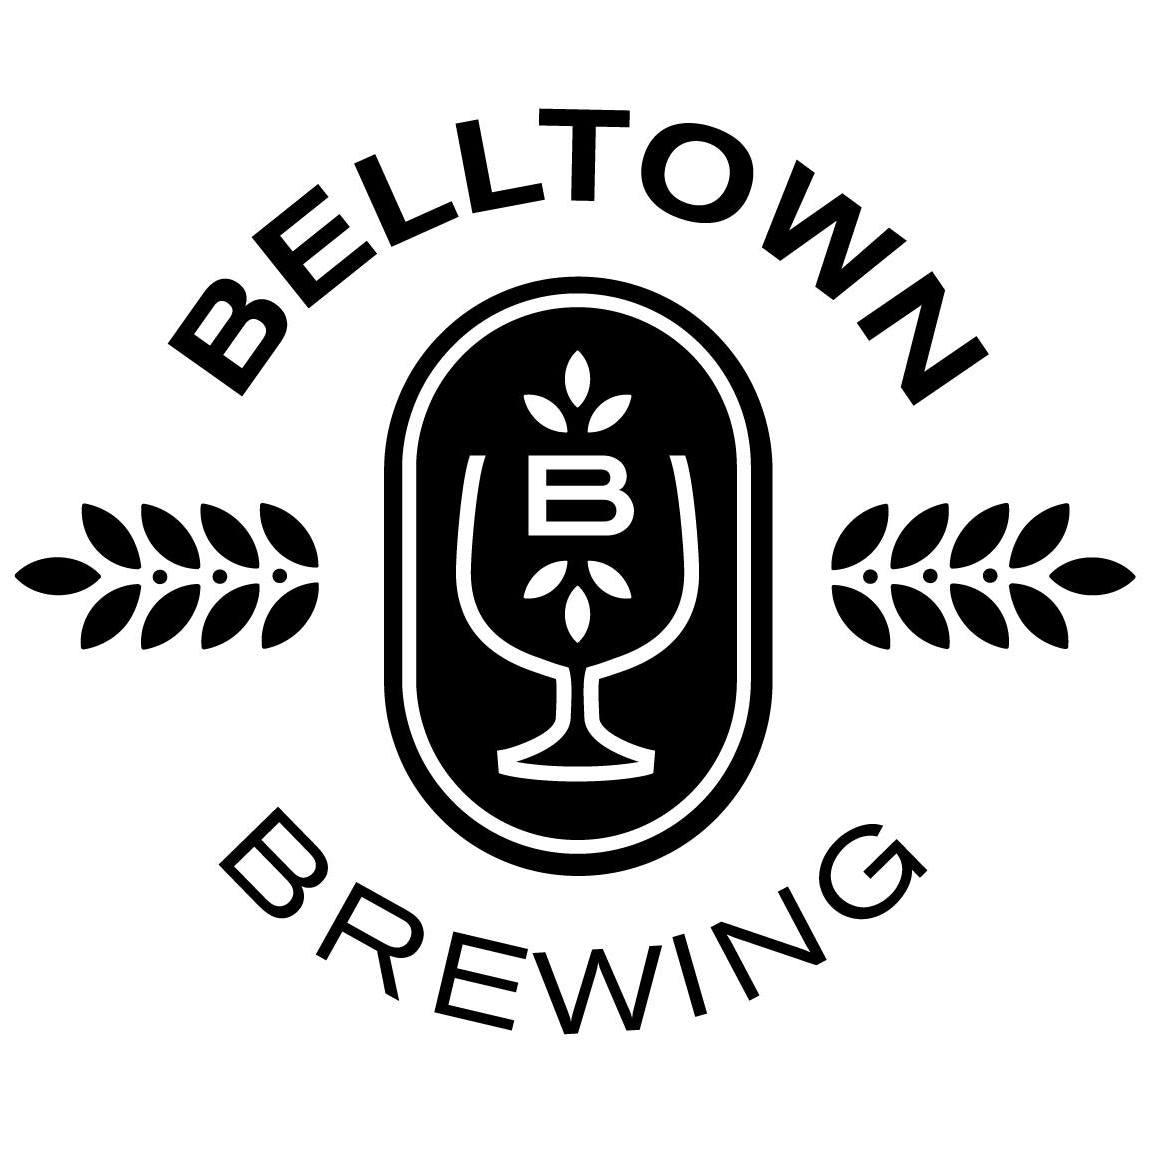 Belltown Brewing Announces Three New Beers | Craft Beer Monger